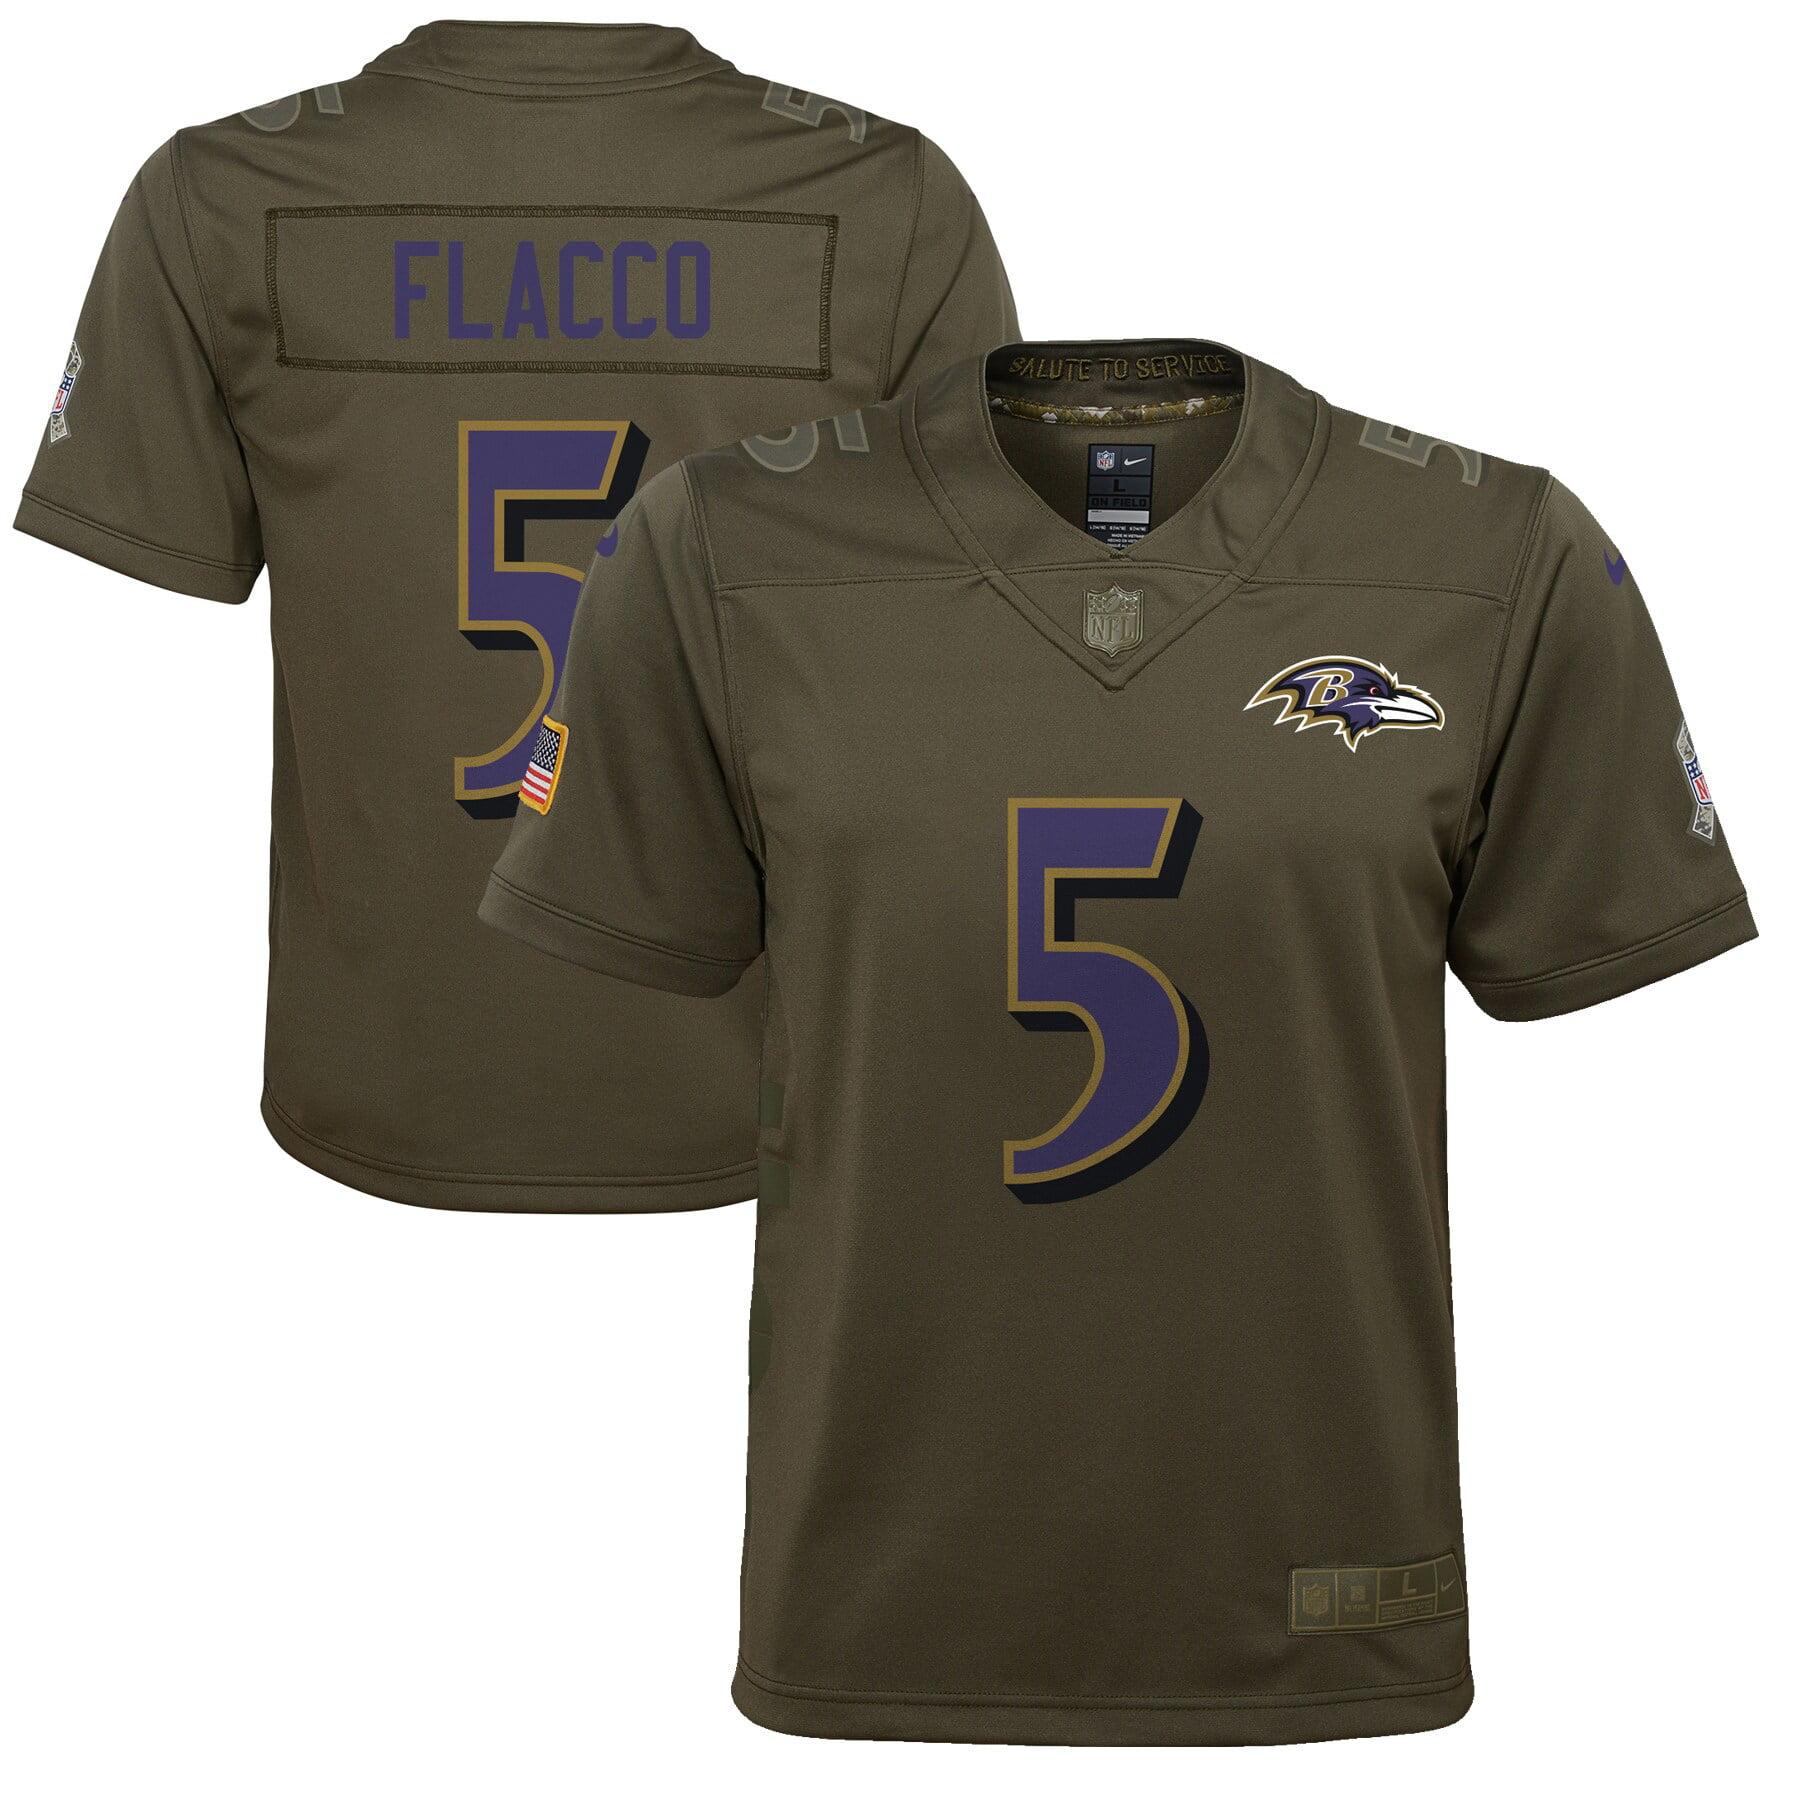 Joe Flacco Baltimore Ravens Nike Youth Salute to Service Game Jersey - Olive - Walmart.com